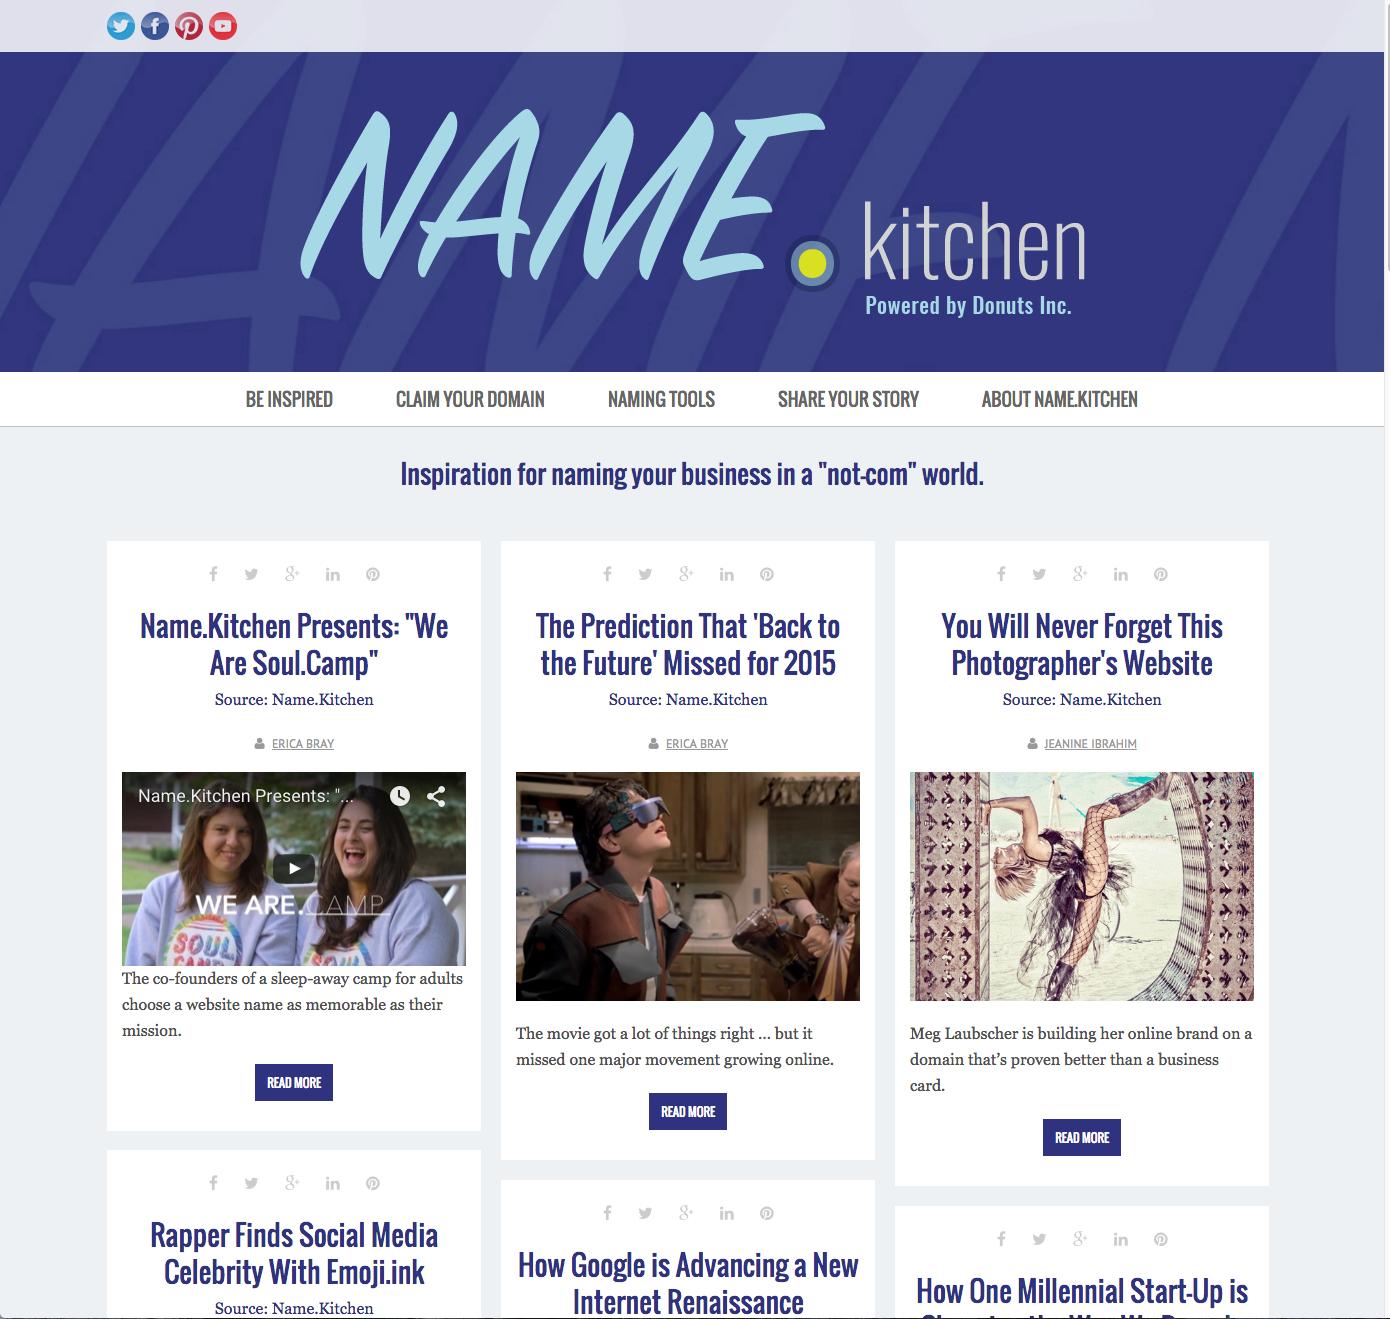 Name.Kitchen Website